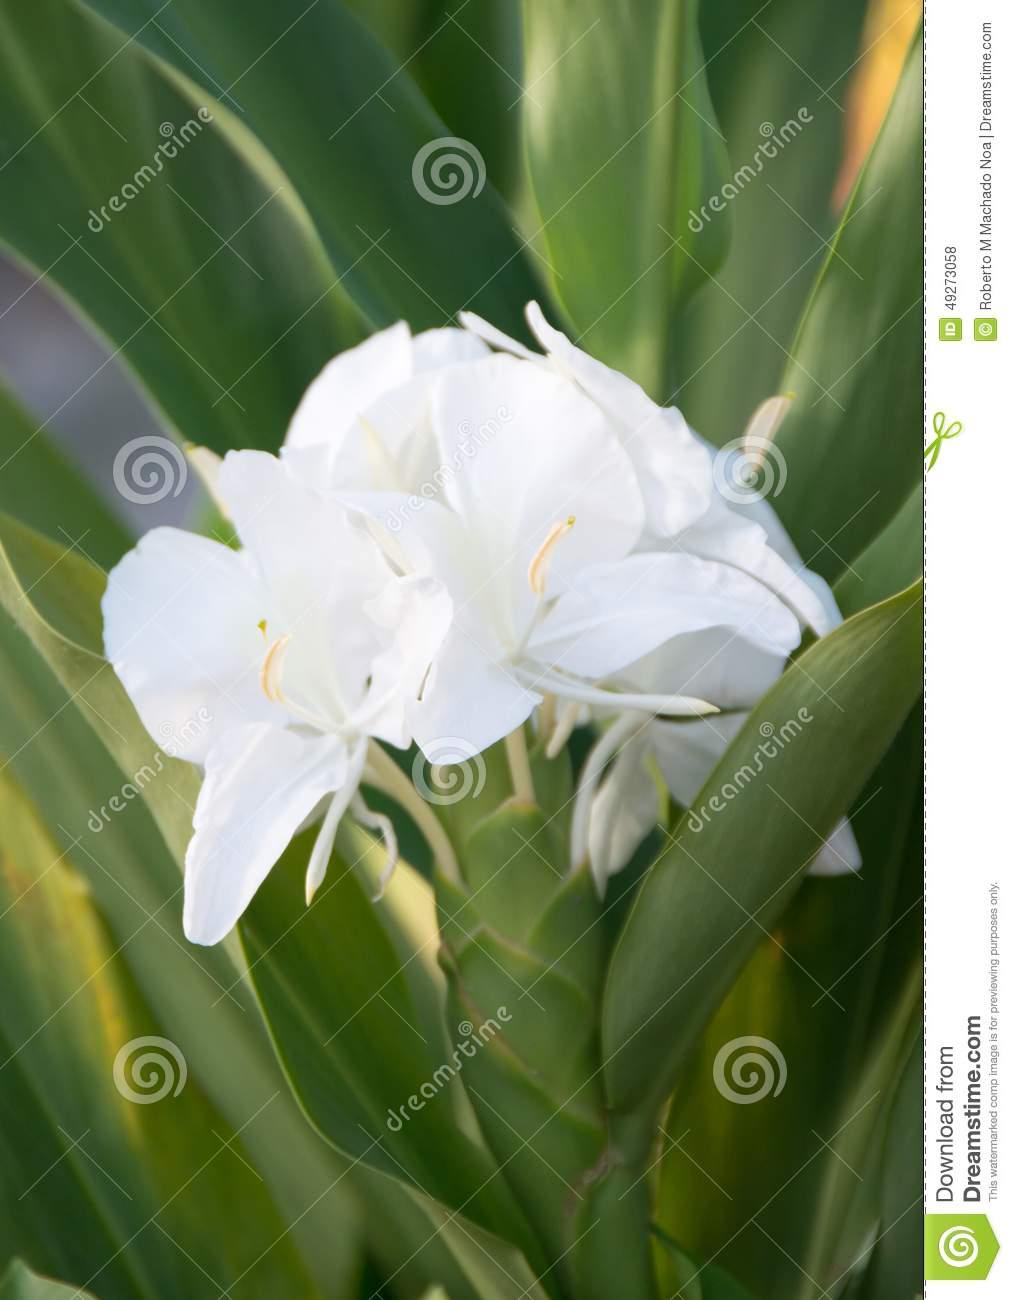 White Ginger Or Mariposa, Cuban National Flower Stock Photo.